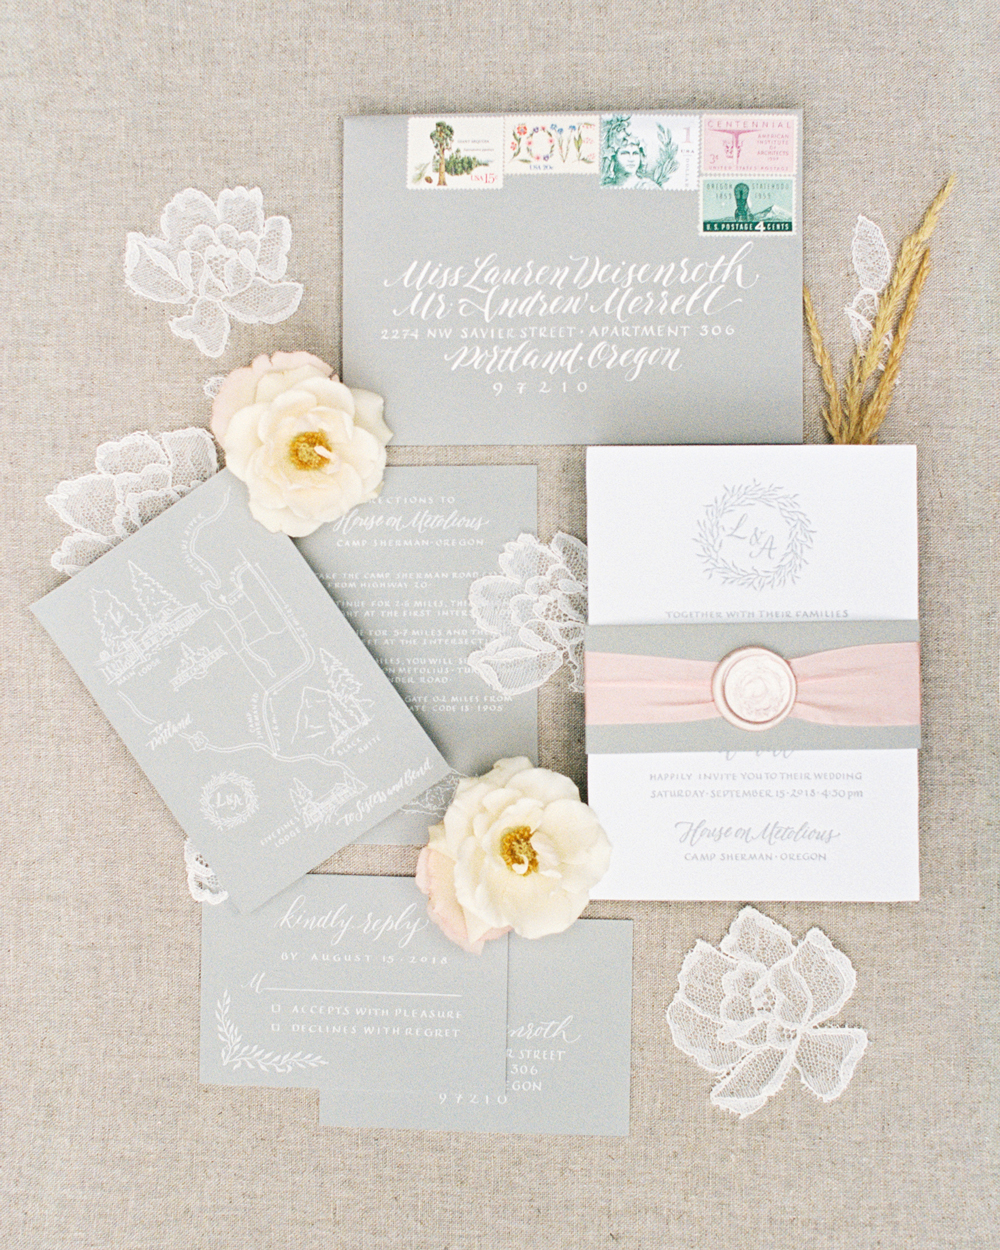 ribbon wedding ideas wax seal and pink ribbon wrapped around invitation